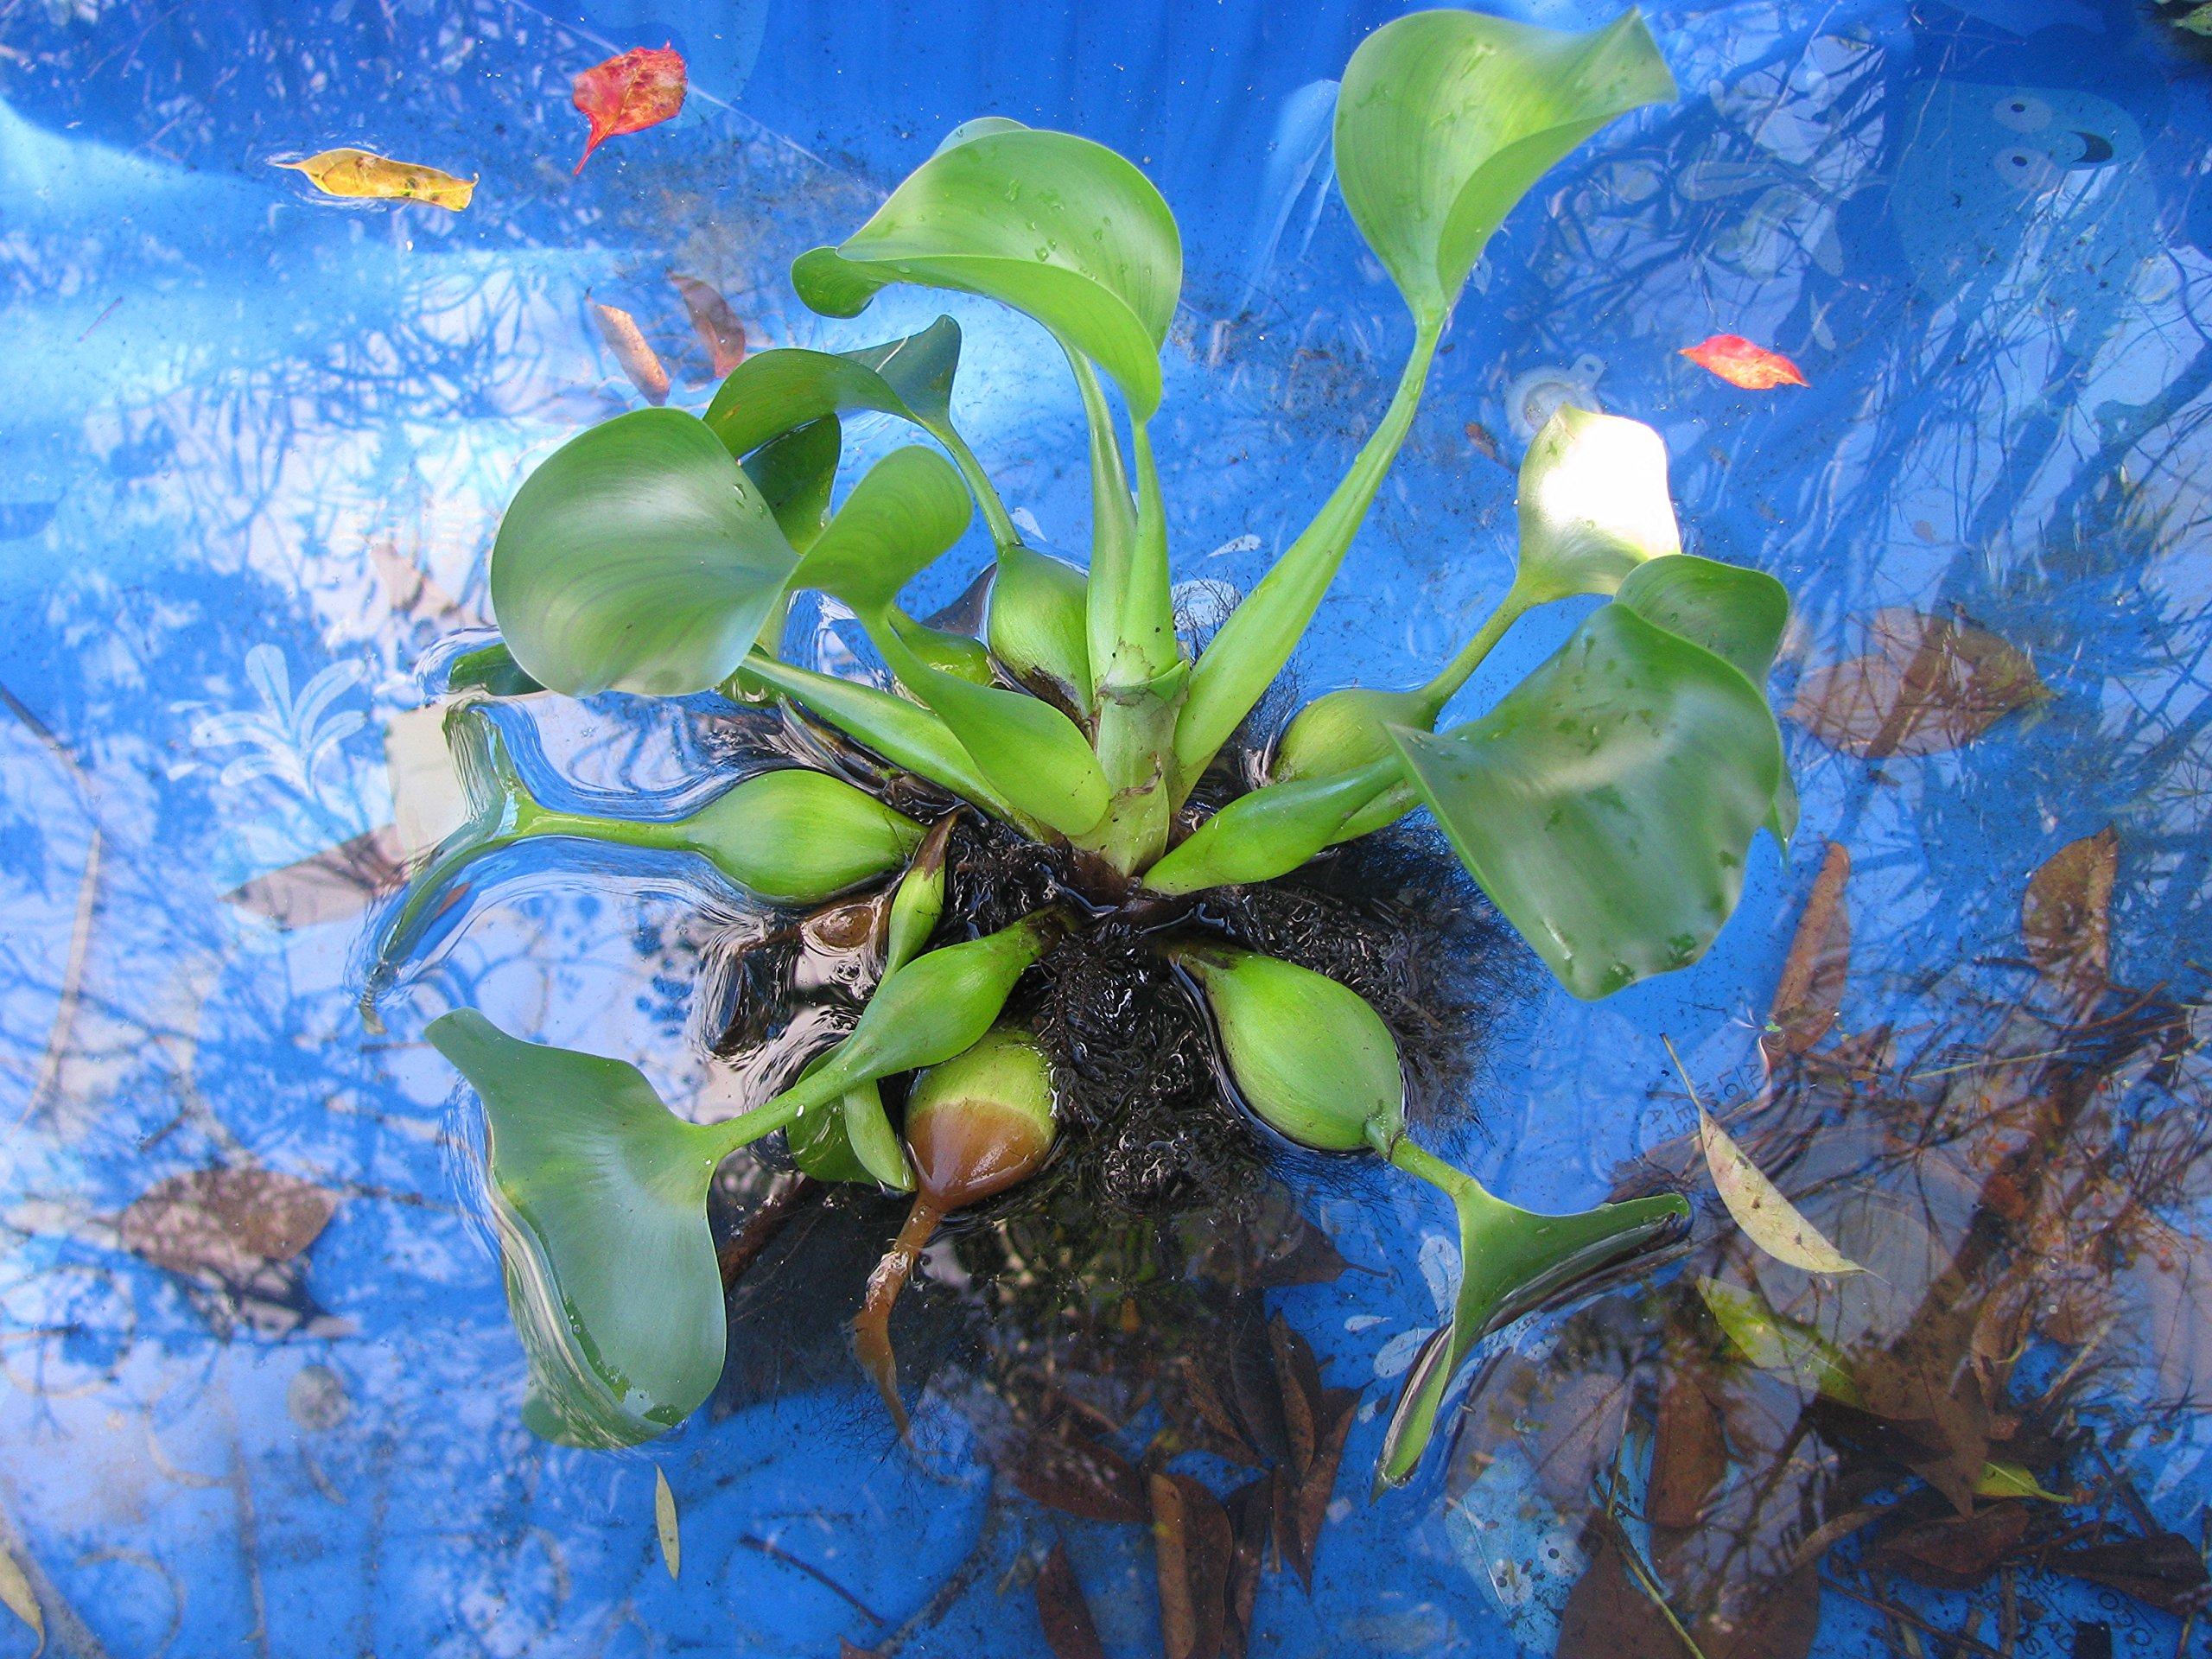 Live-water-hyacinth 1 Plants 5''-8''-pond-plants-healthy-biofilters-w-freewaterlettuce .